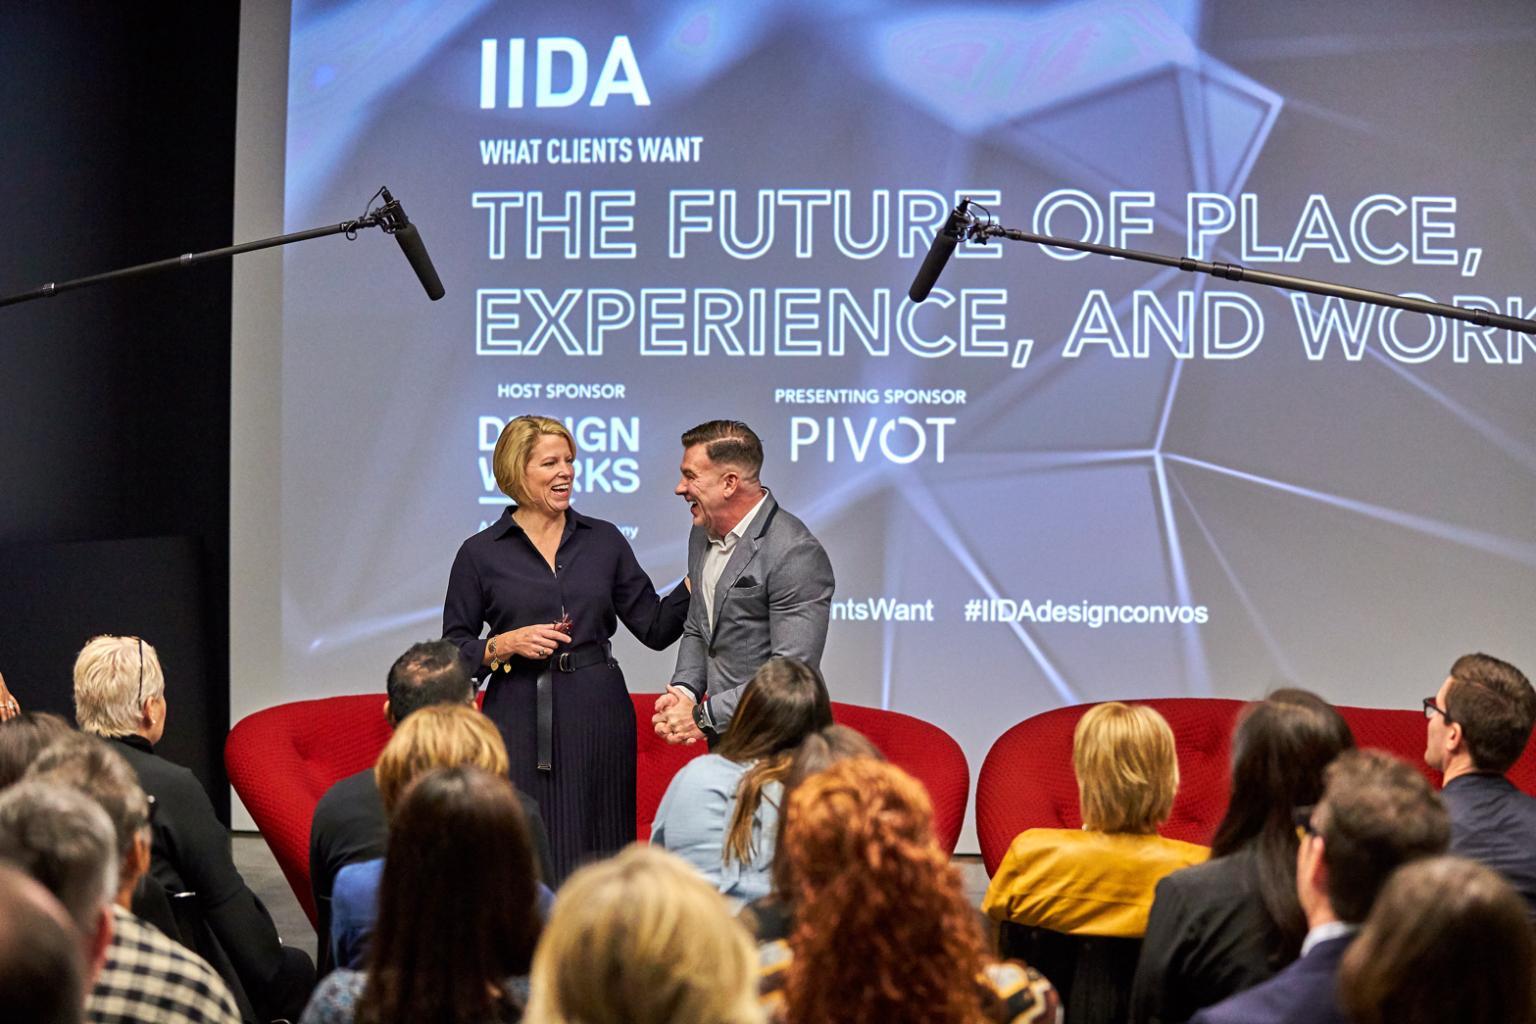 IIDA Presentation at Designworks